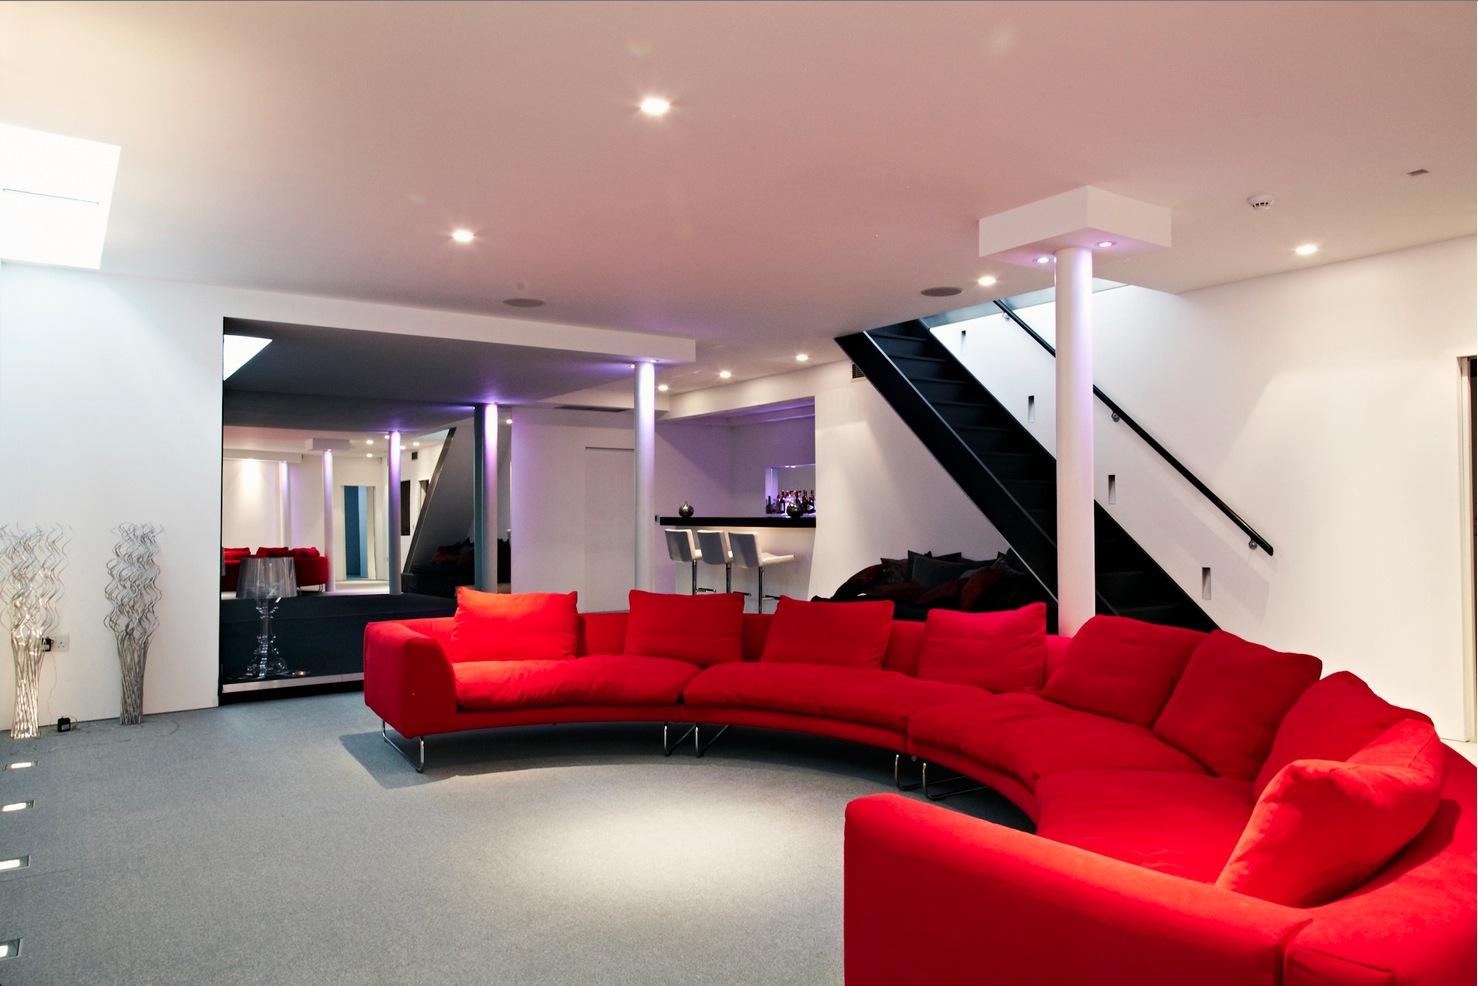 Cinema Room Red Couch Interior Design